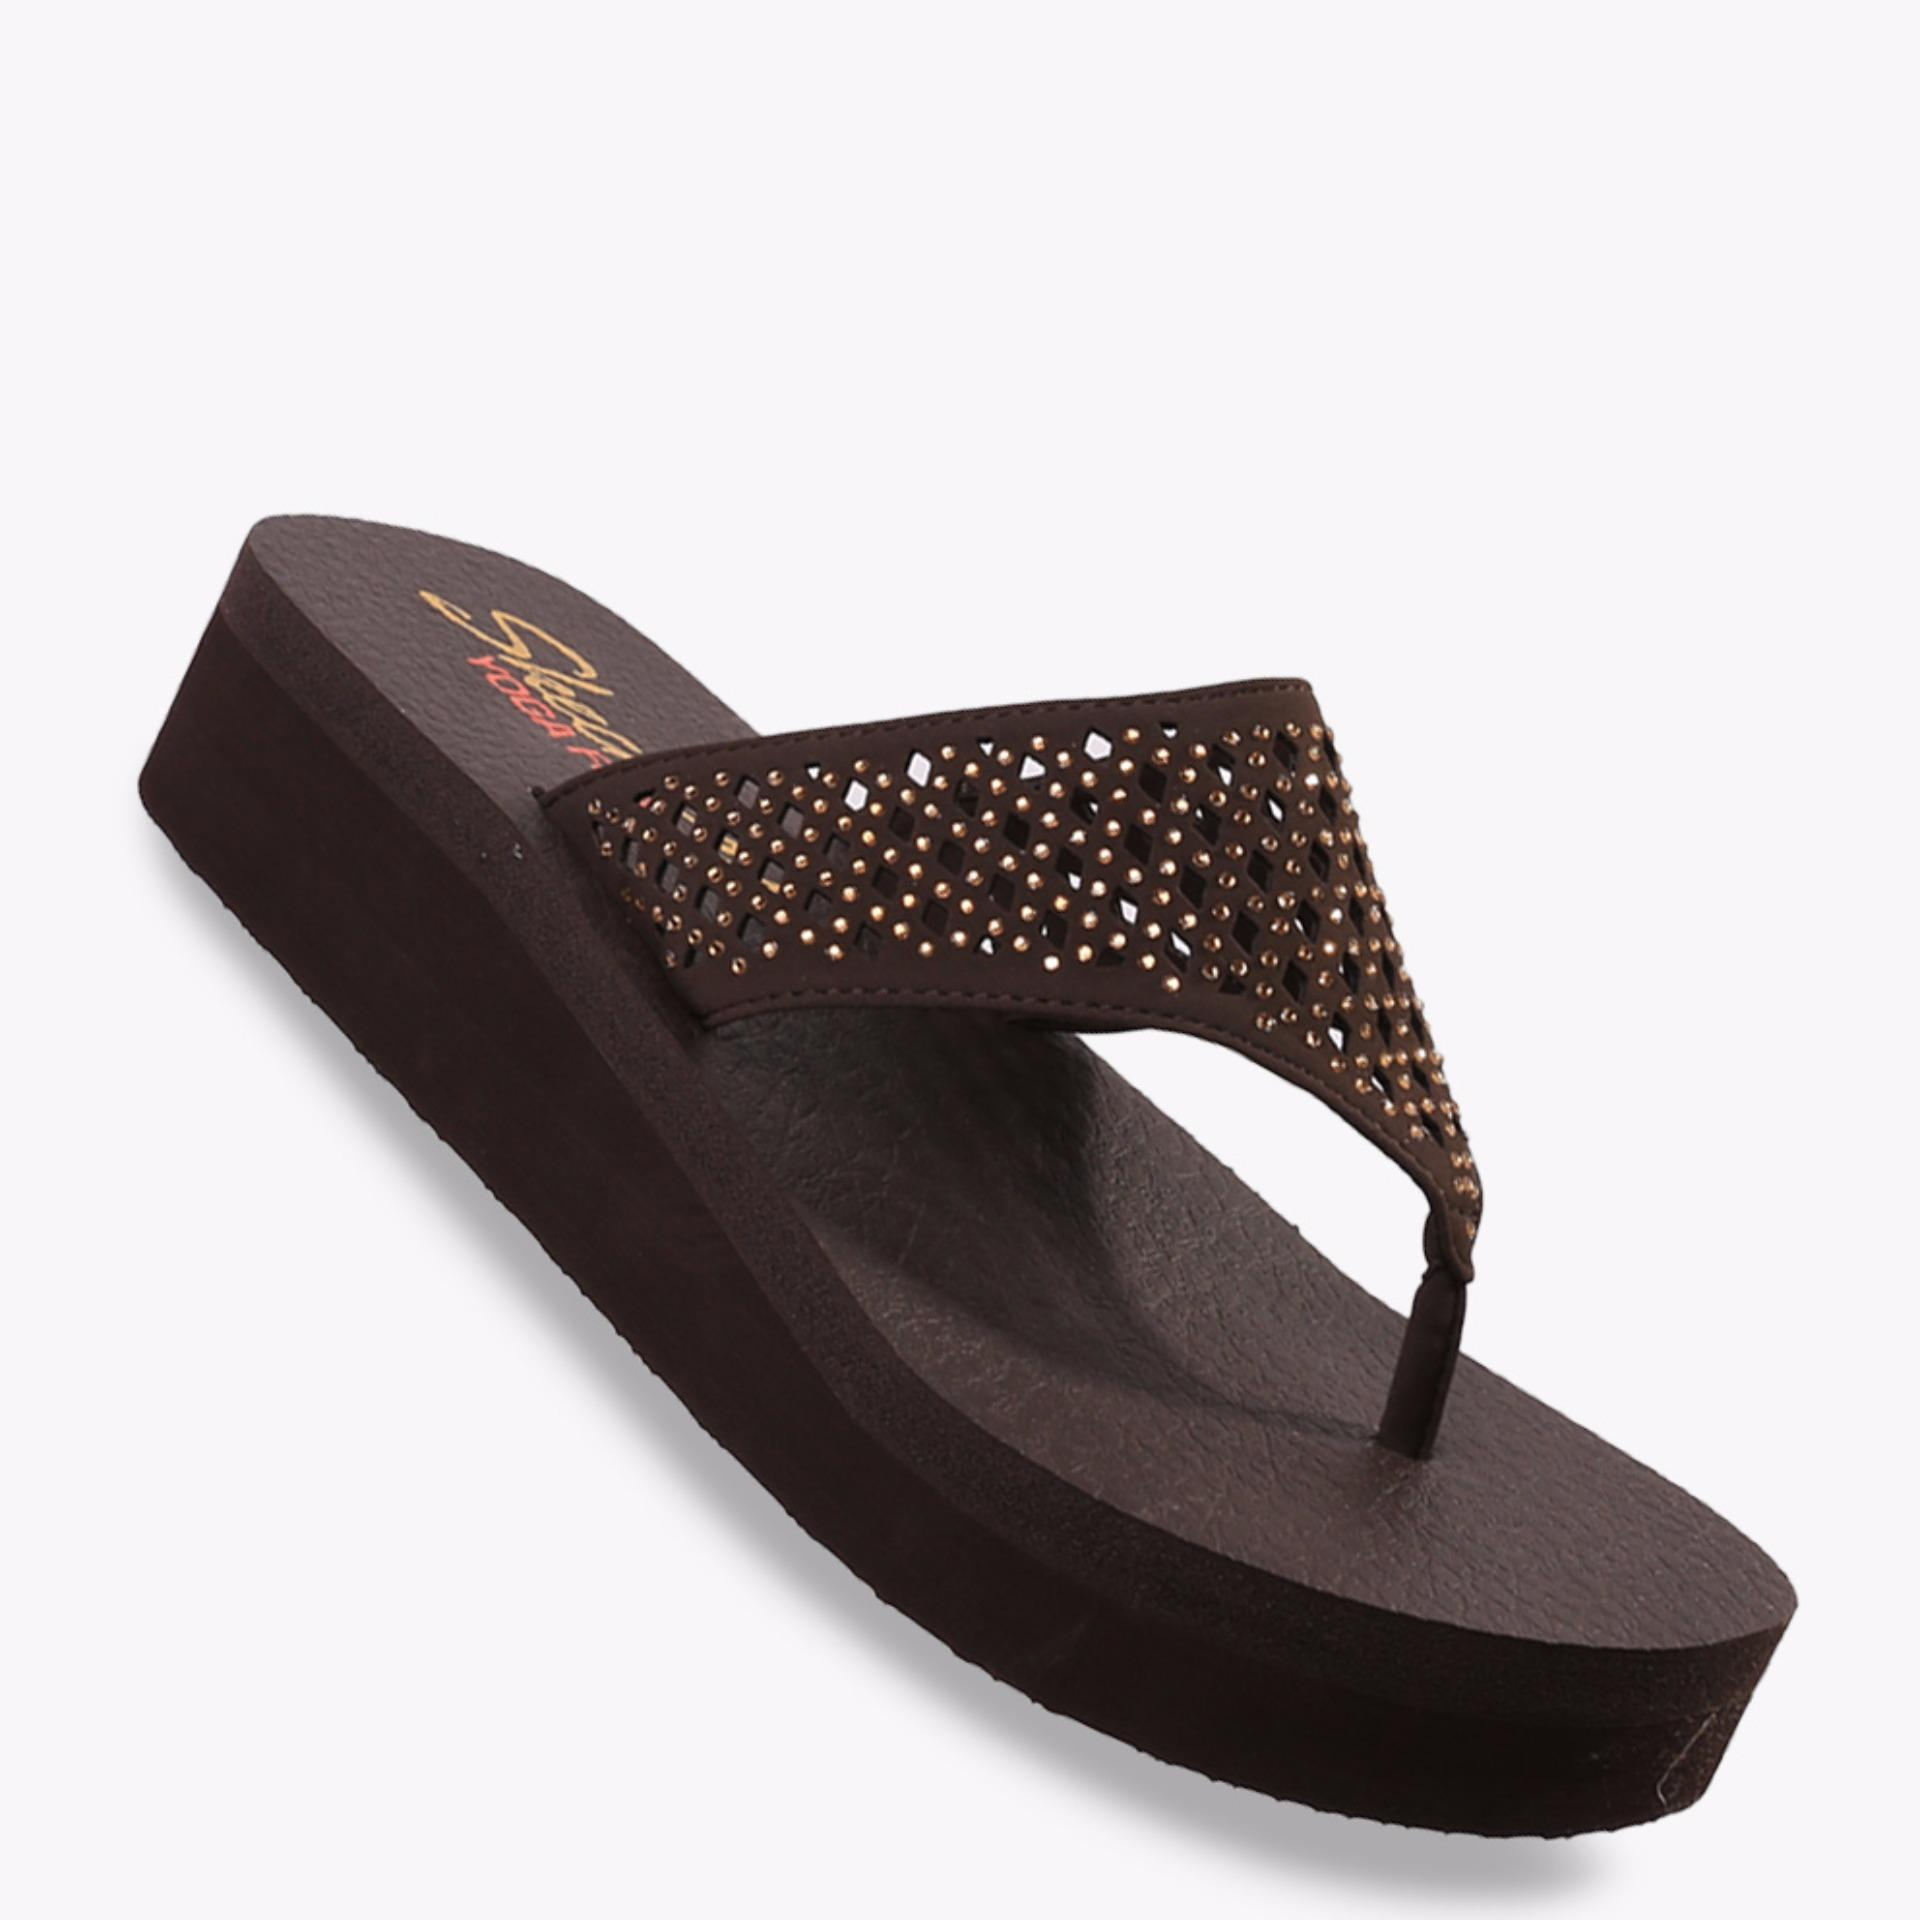 Beli Skechers Vinyasa Flow Women S Sandals Cokelat Yang Bagus